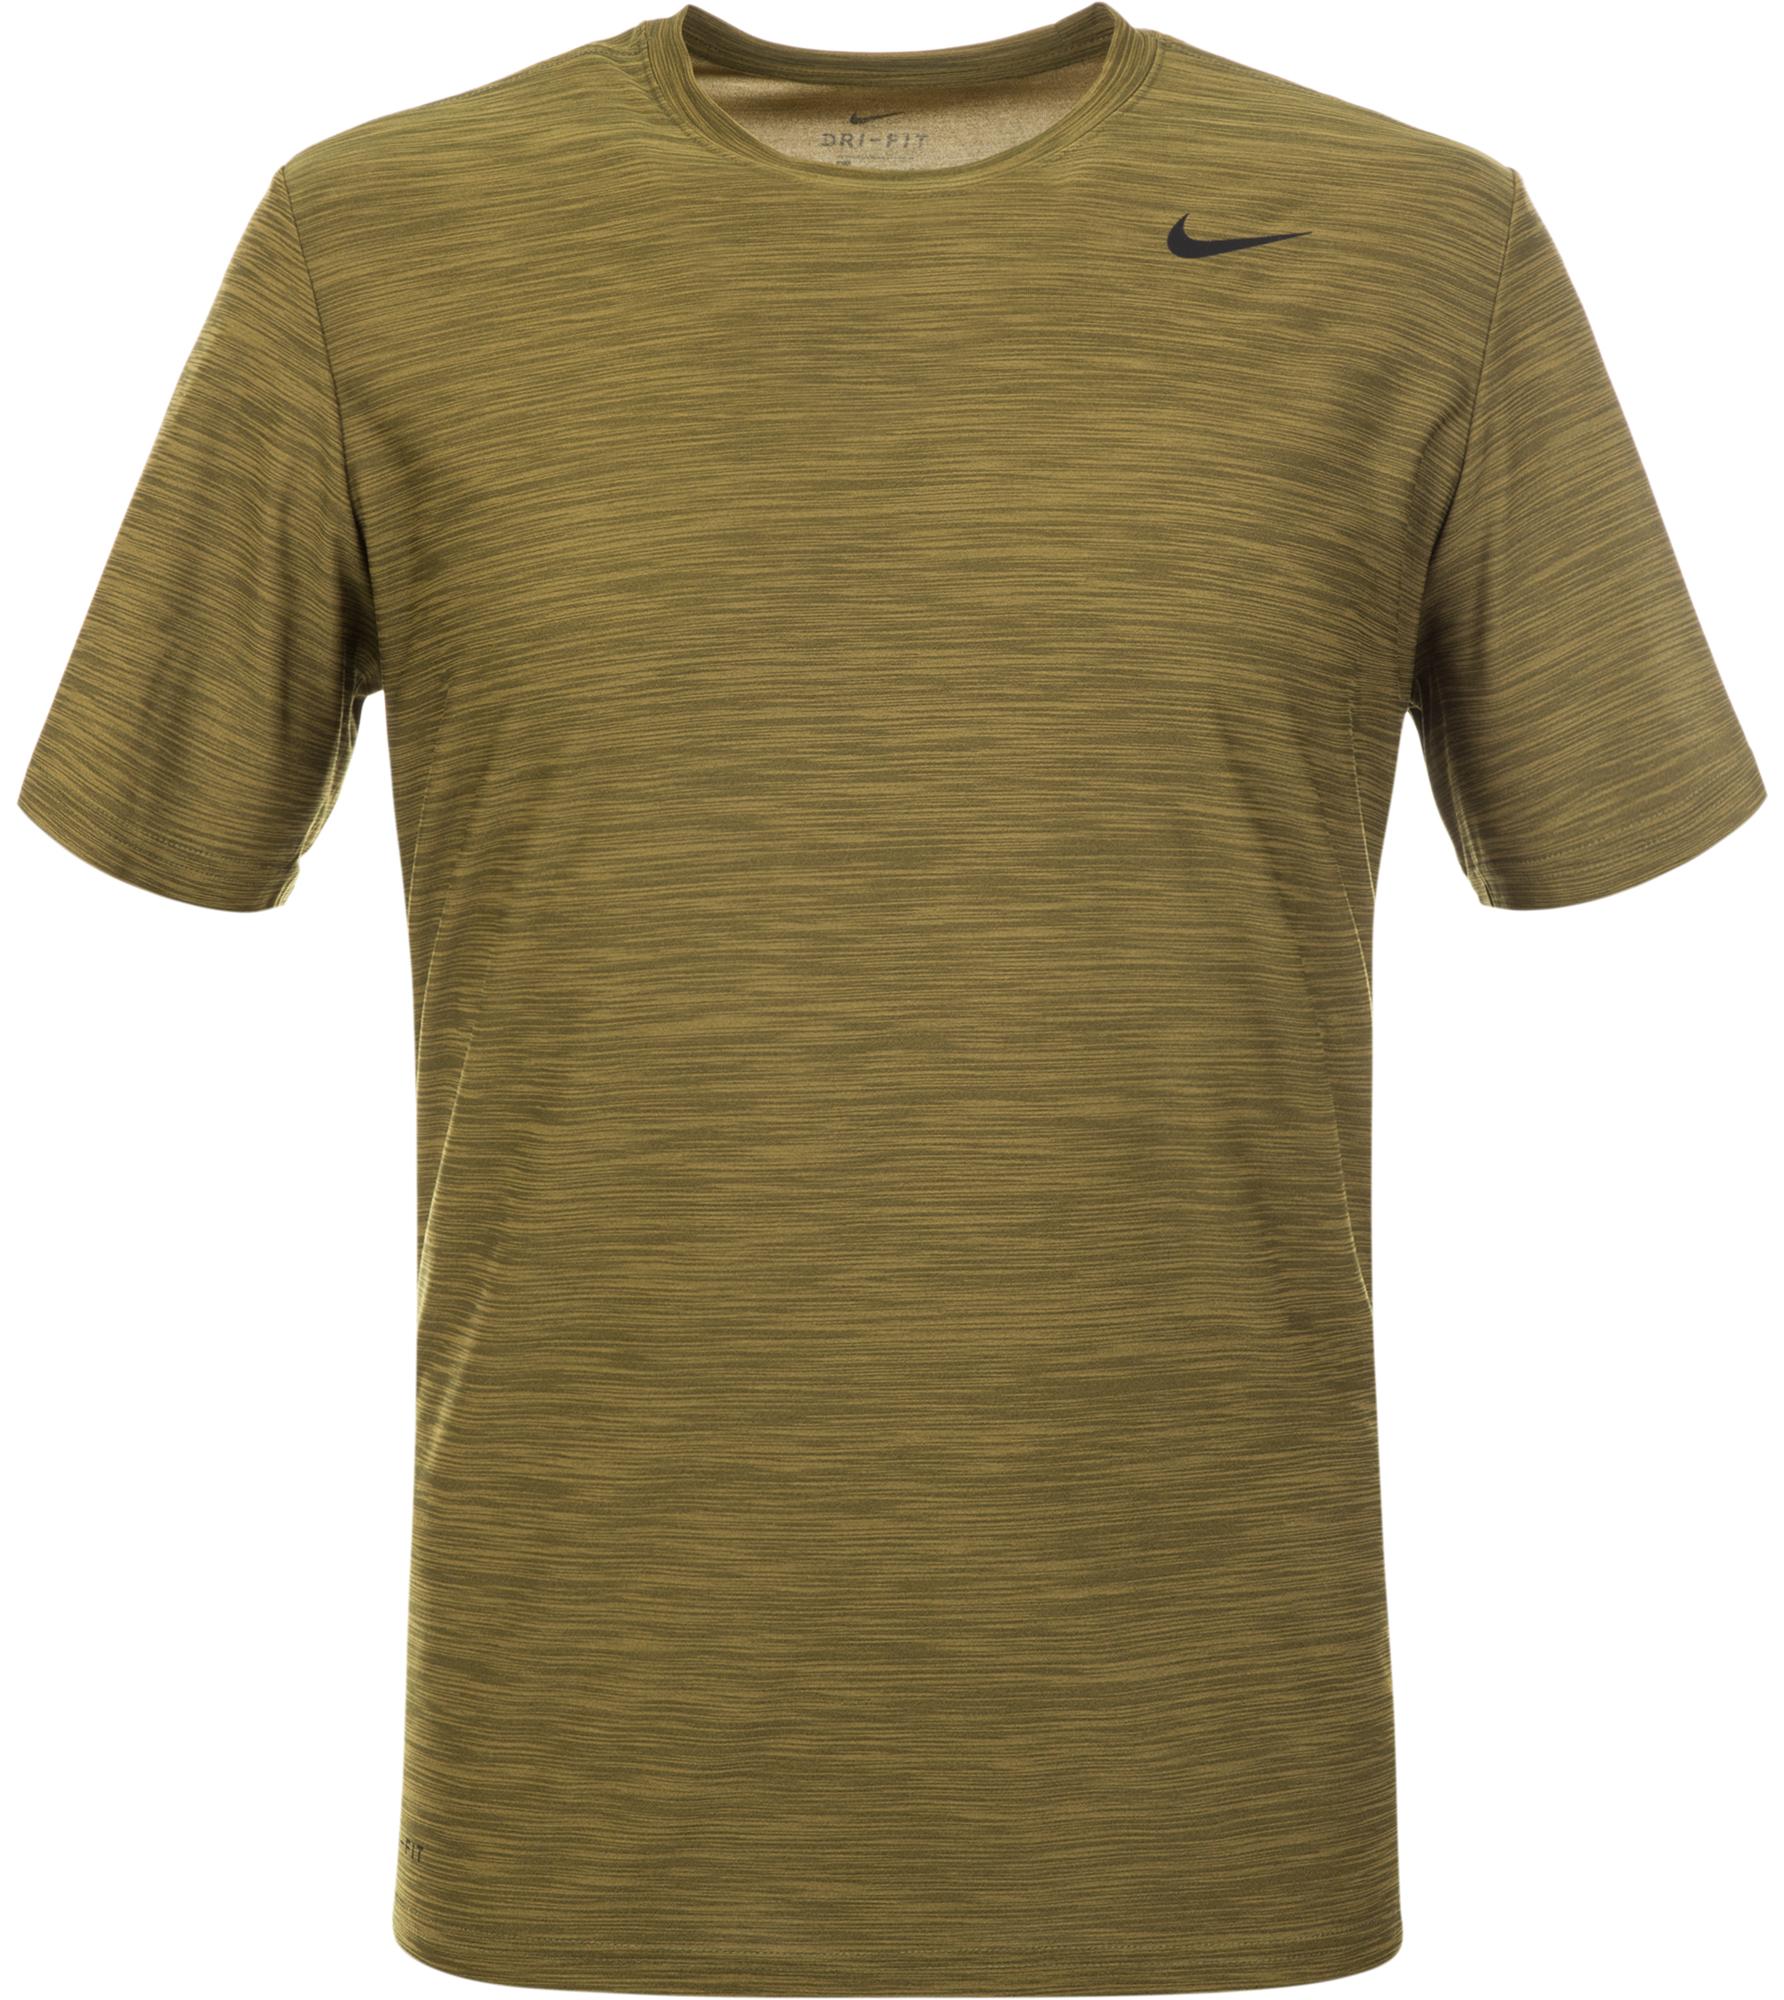 Фото Nike Футболка мужская Nike Dry, размер 52-54